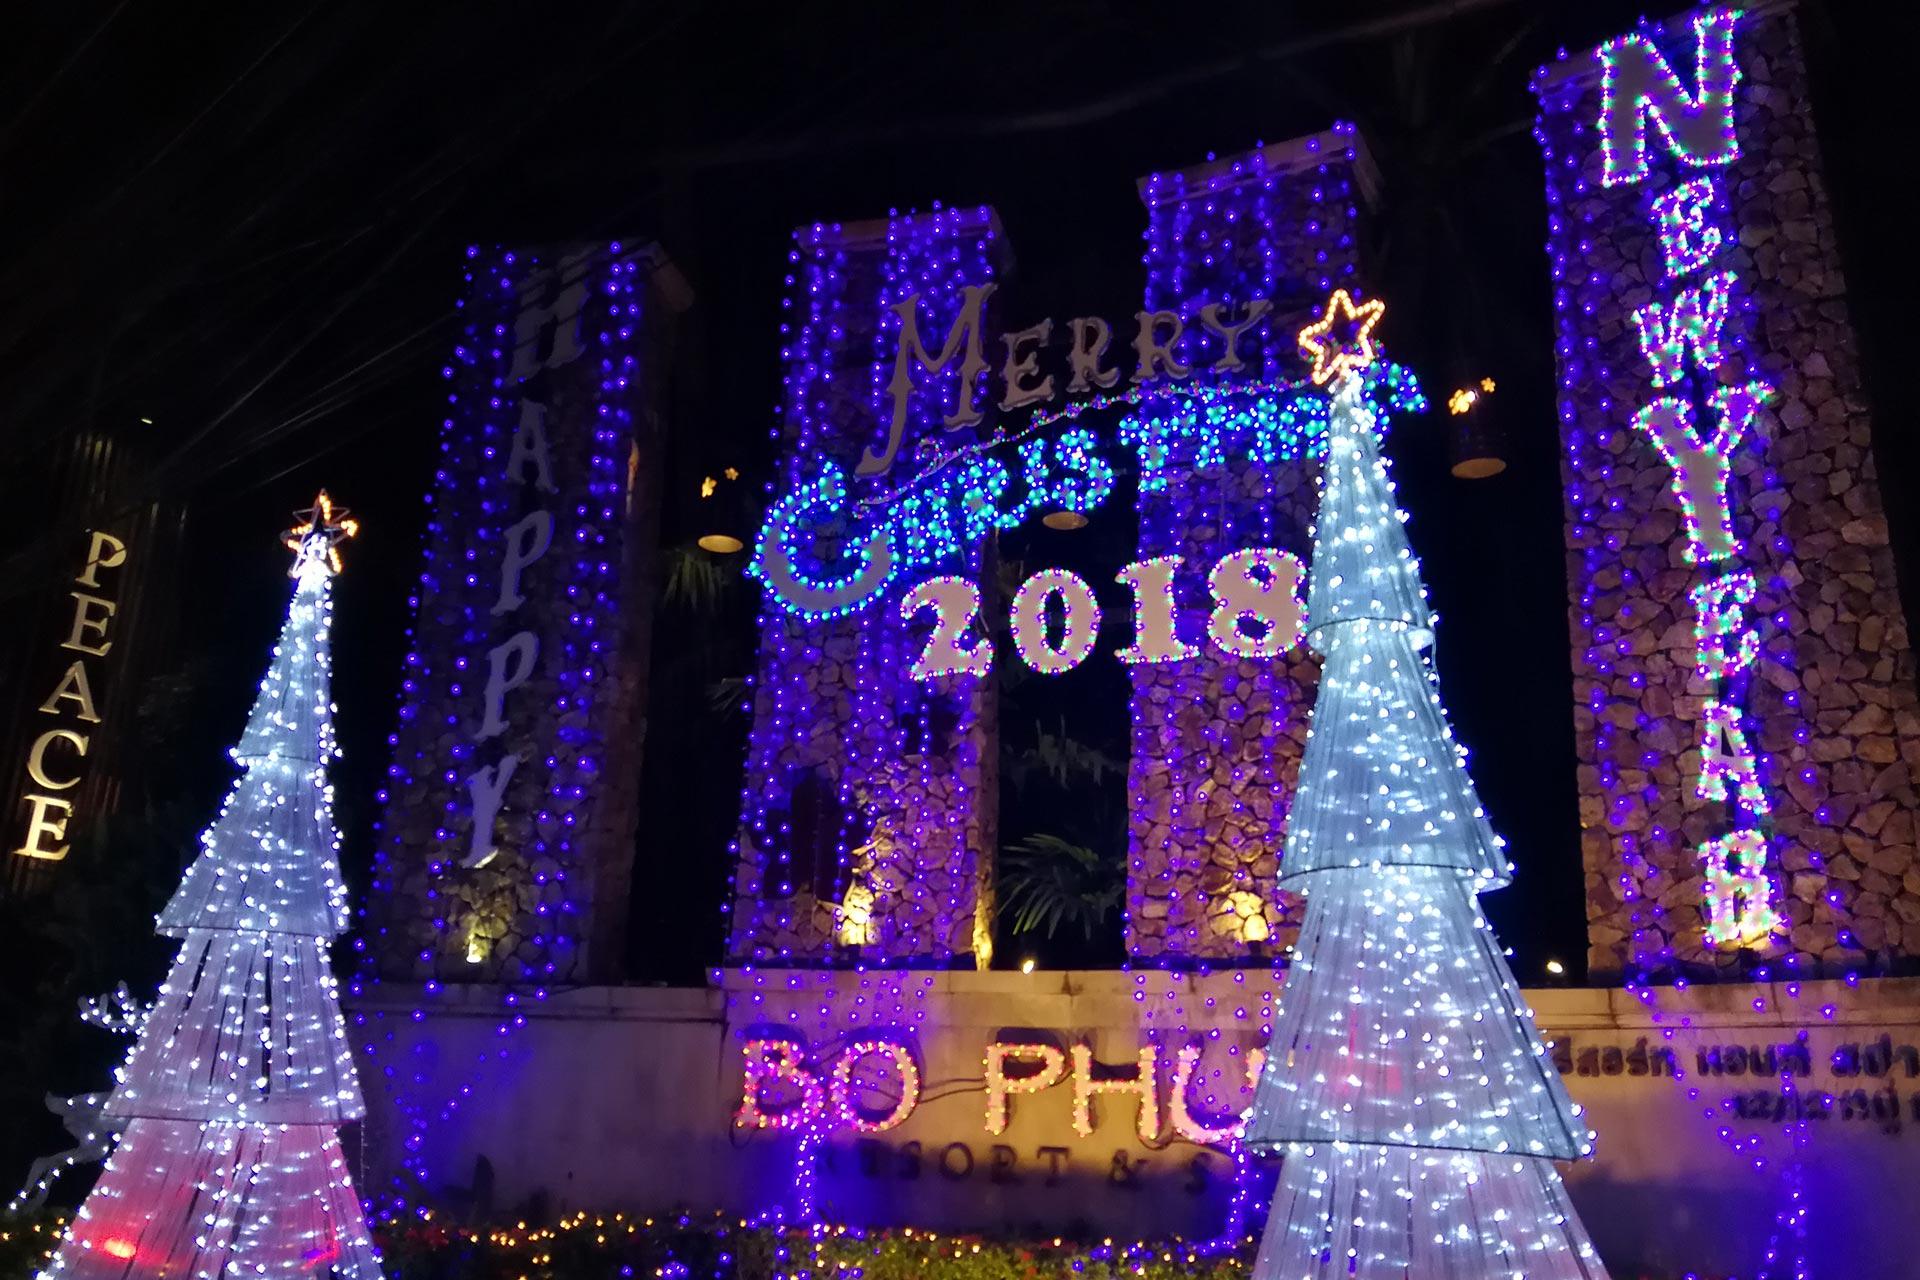 новый год, праздник, салют, Самуи, Таиланд, Чавенг, Арк бар, веселье, пати, heppy new year, Samui, Chaveng , пляж, море